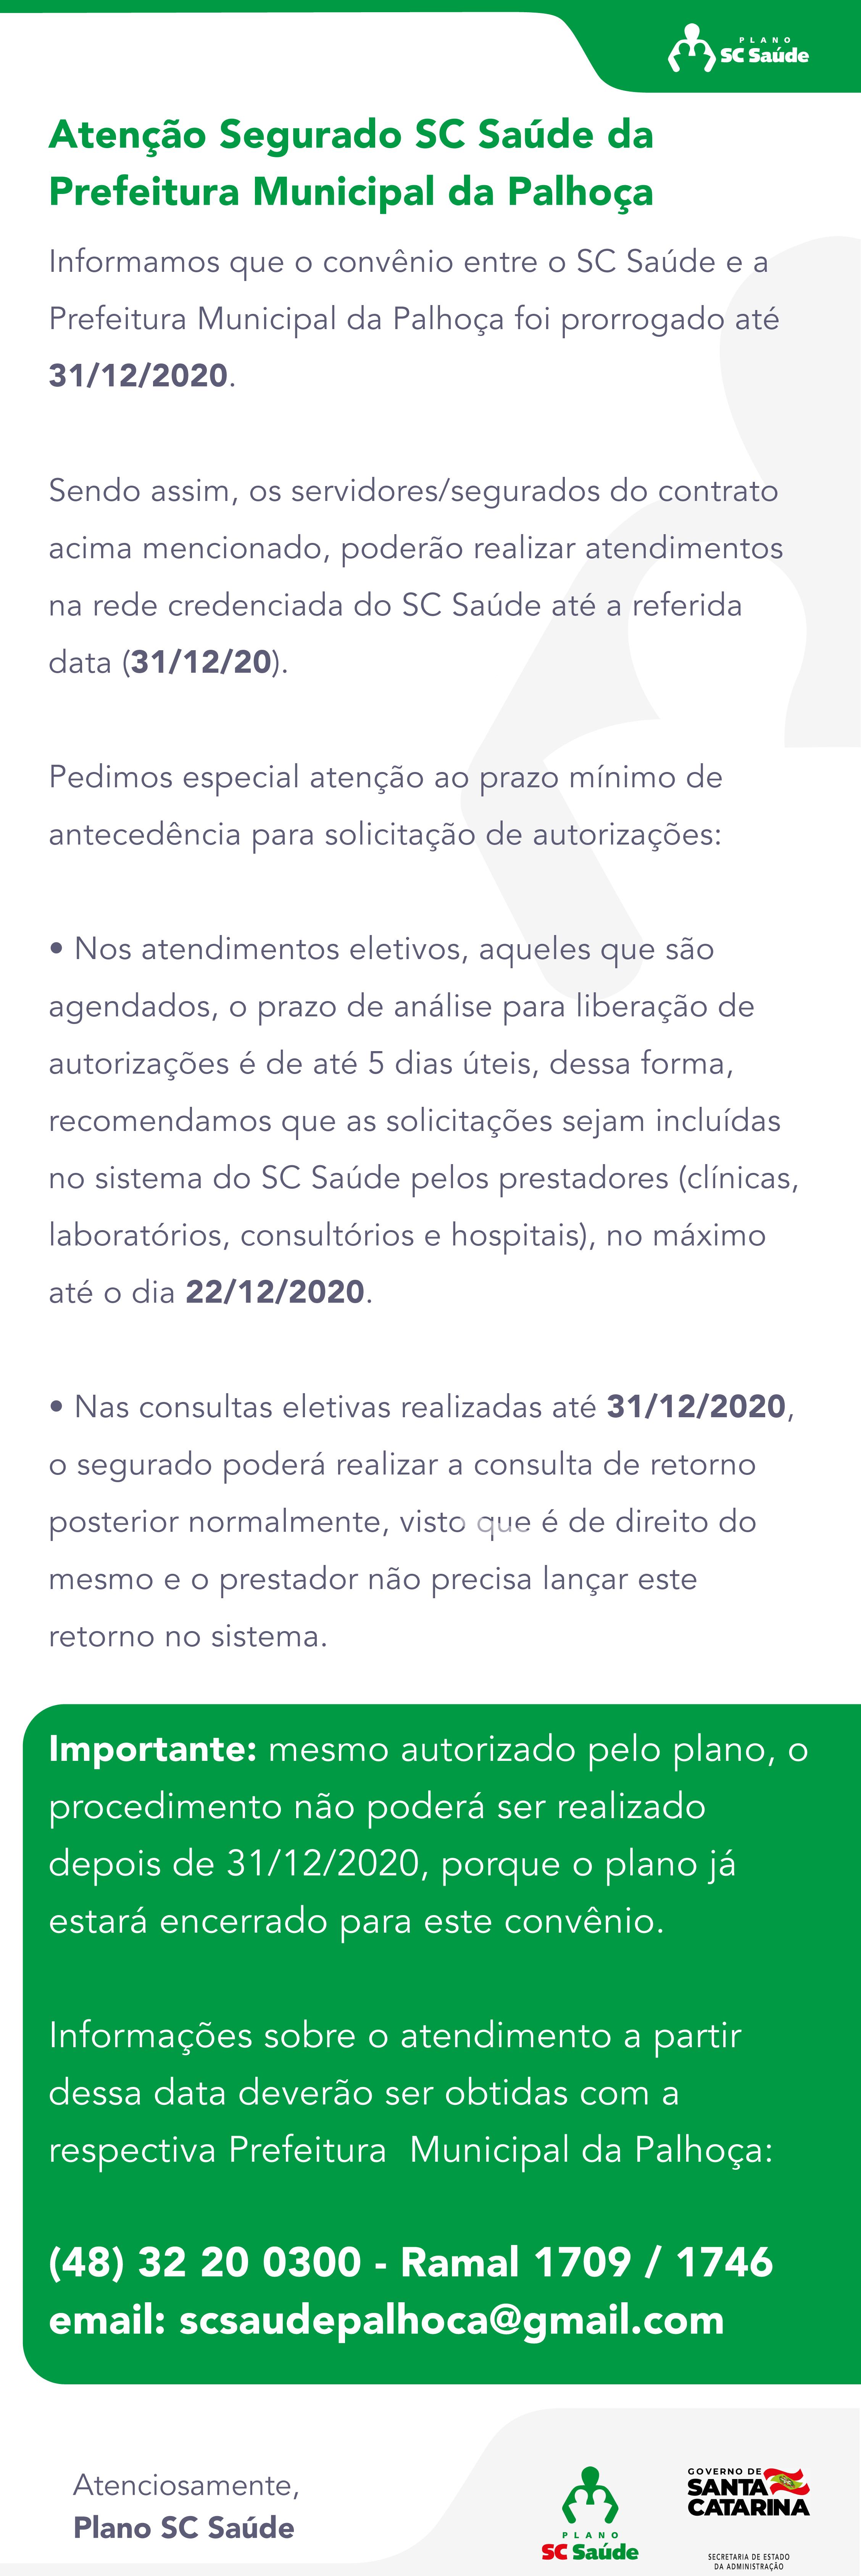 06/08/2020